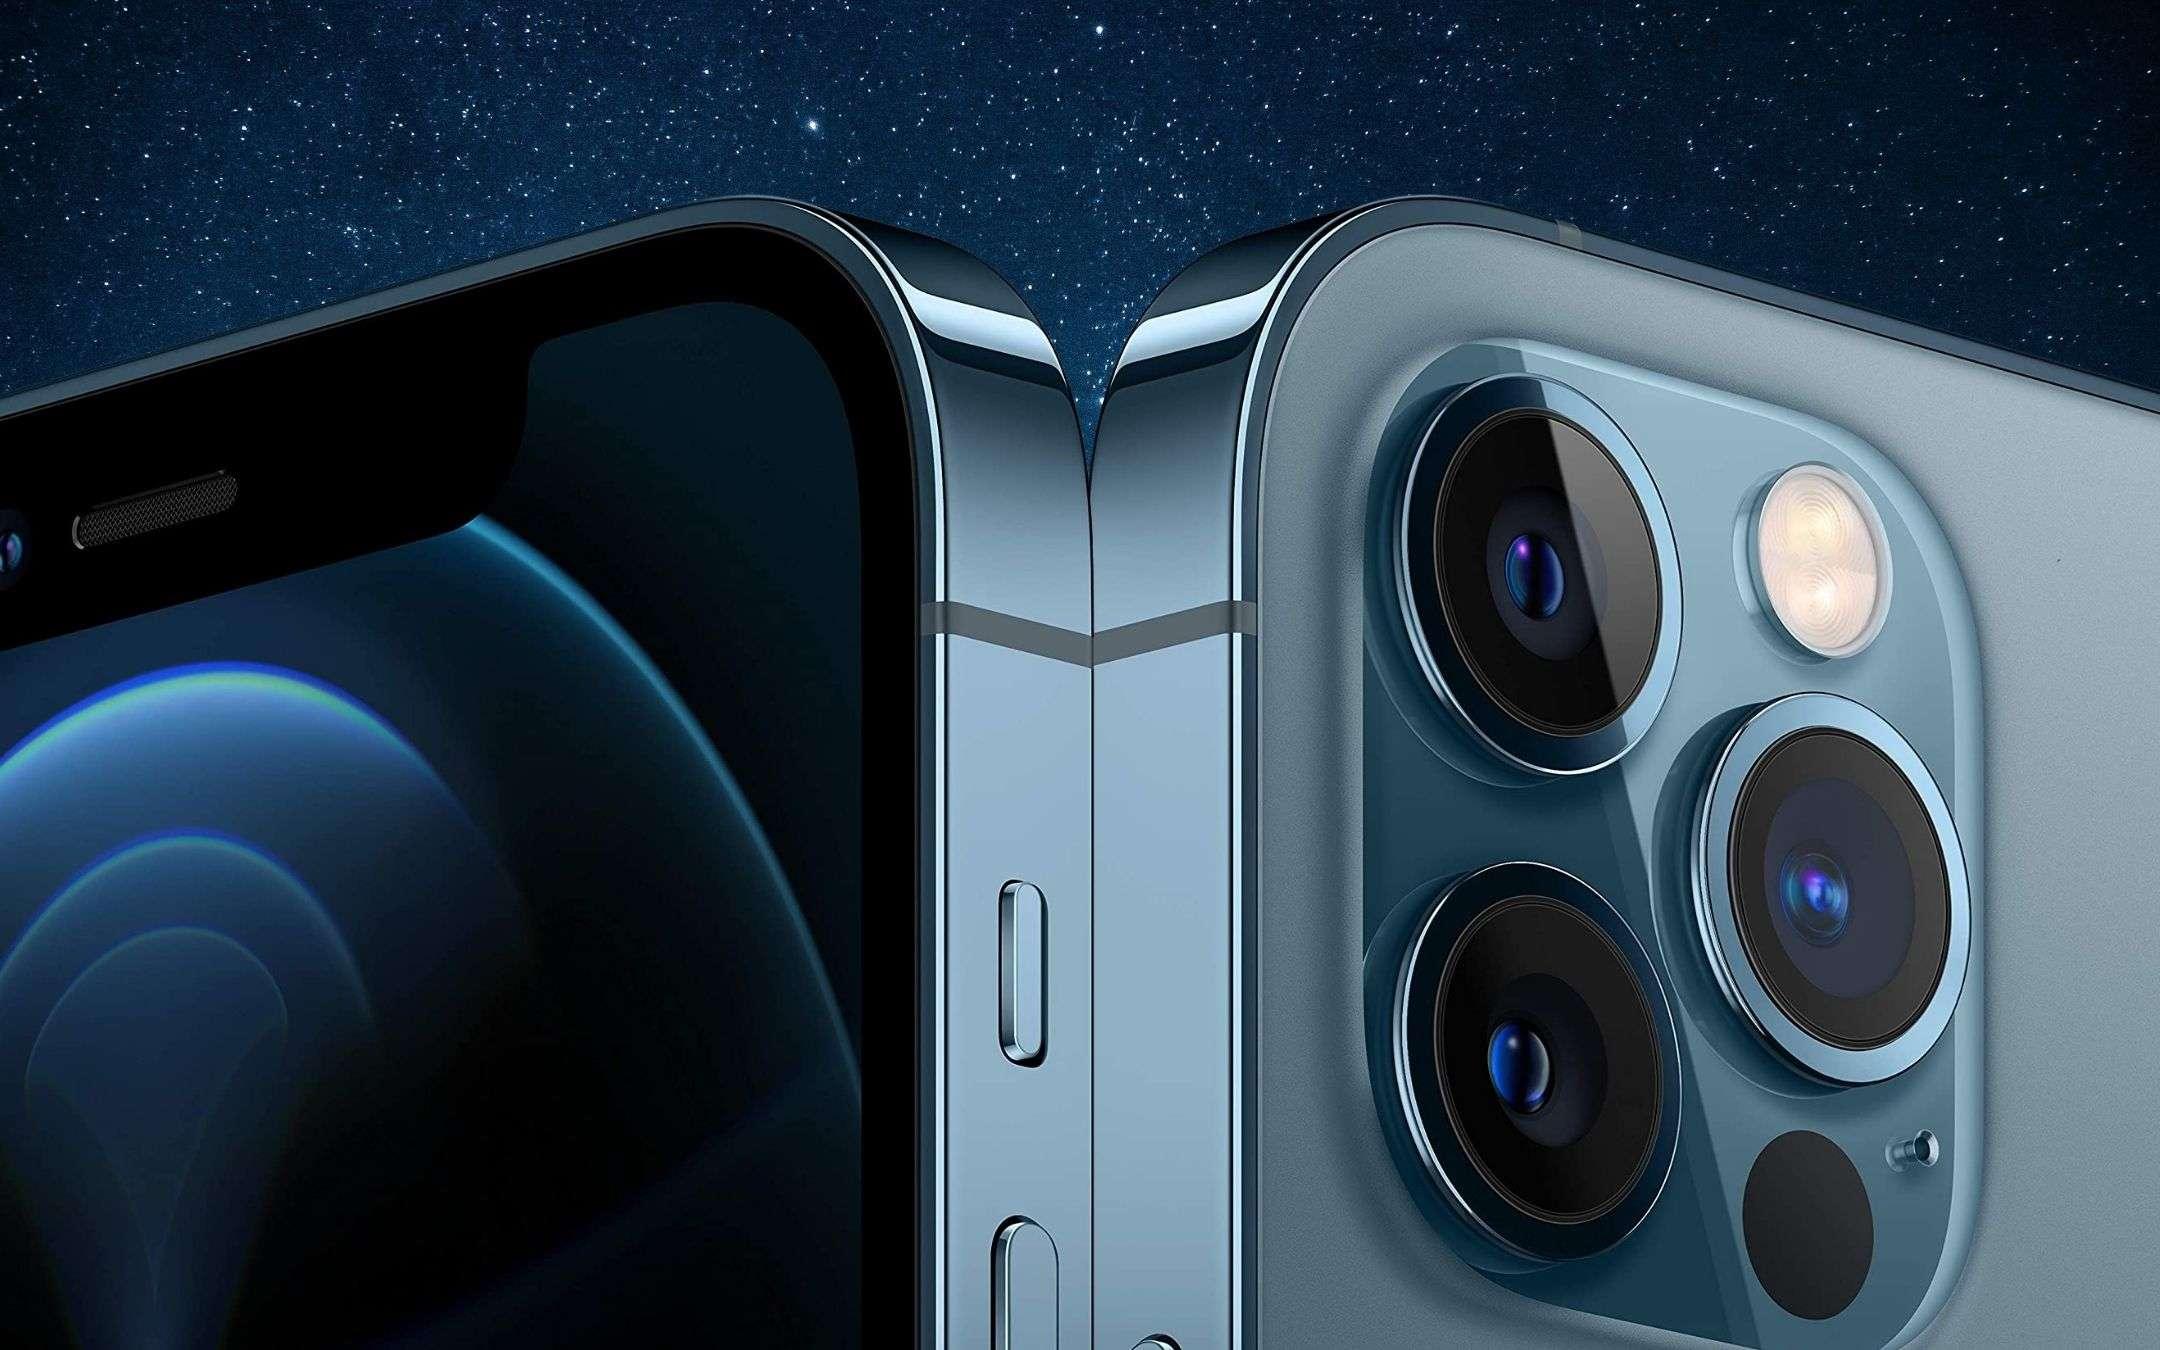 Effetto iPhone 13: iPhone 12 Pro CROLLA a 911€ (sconto 277€)